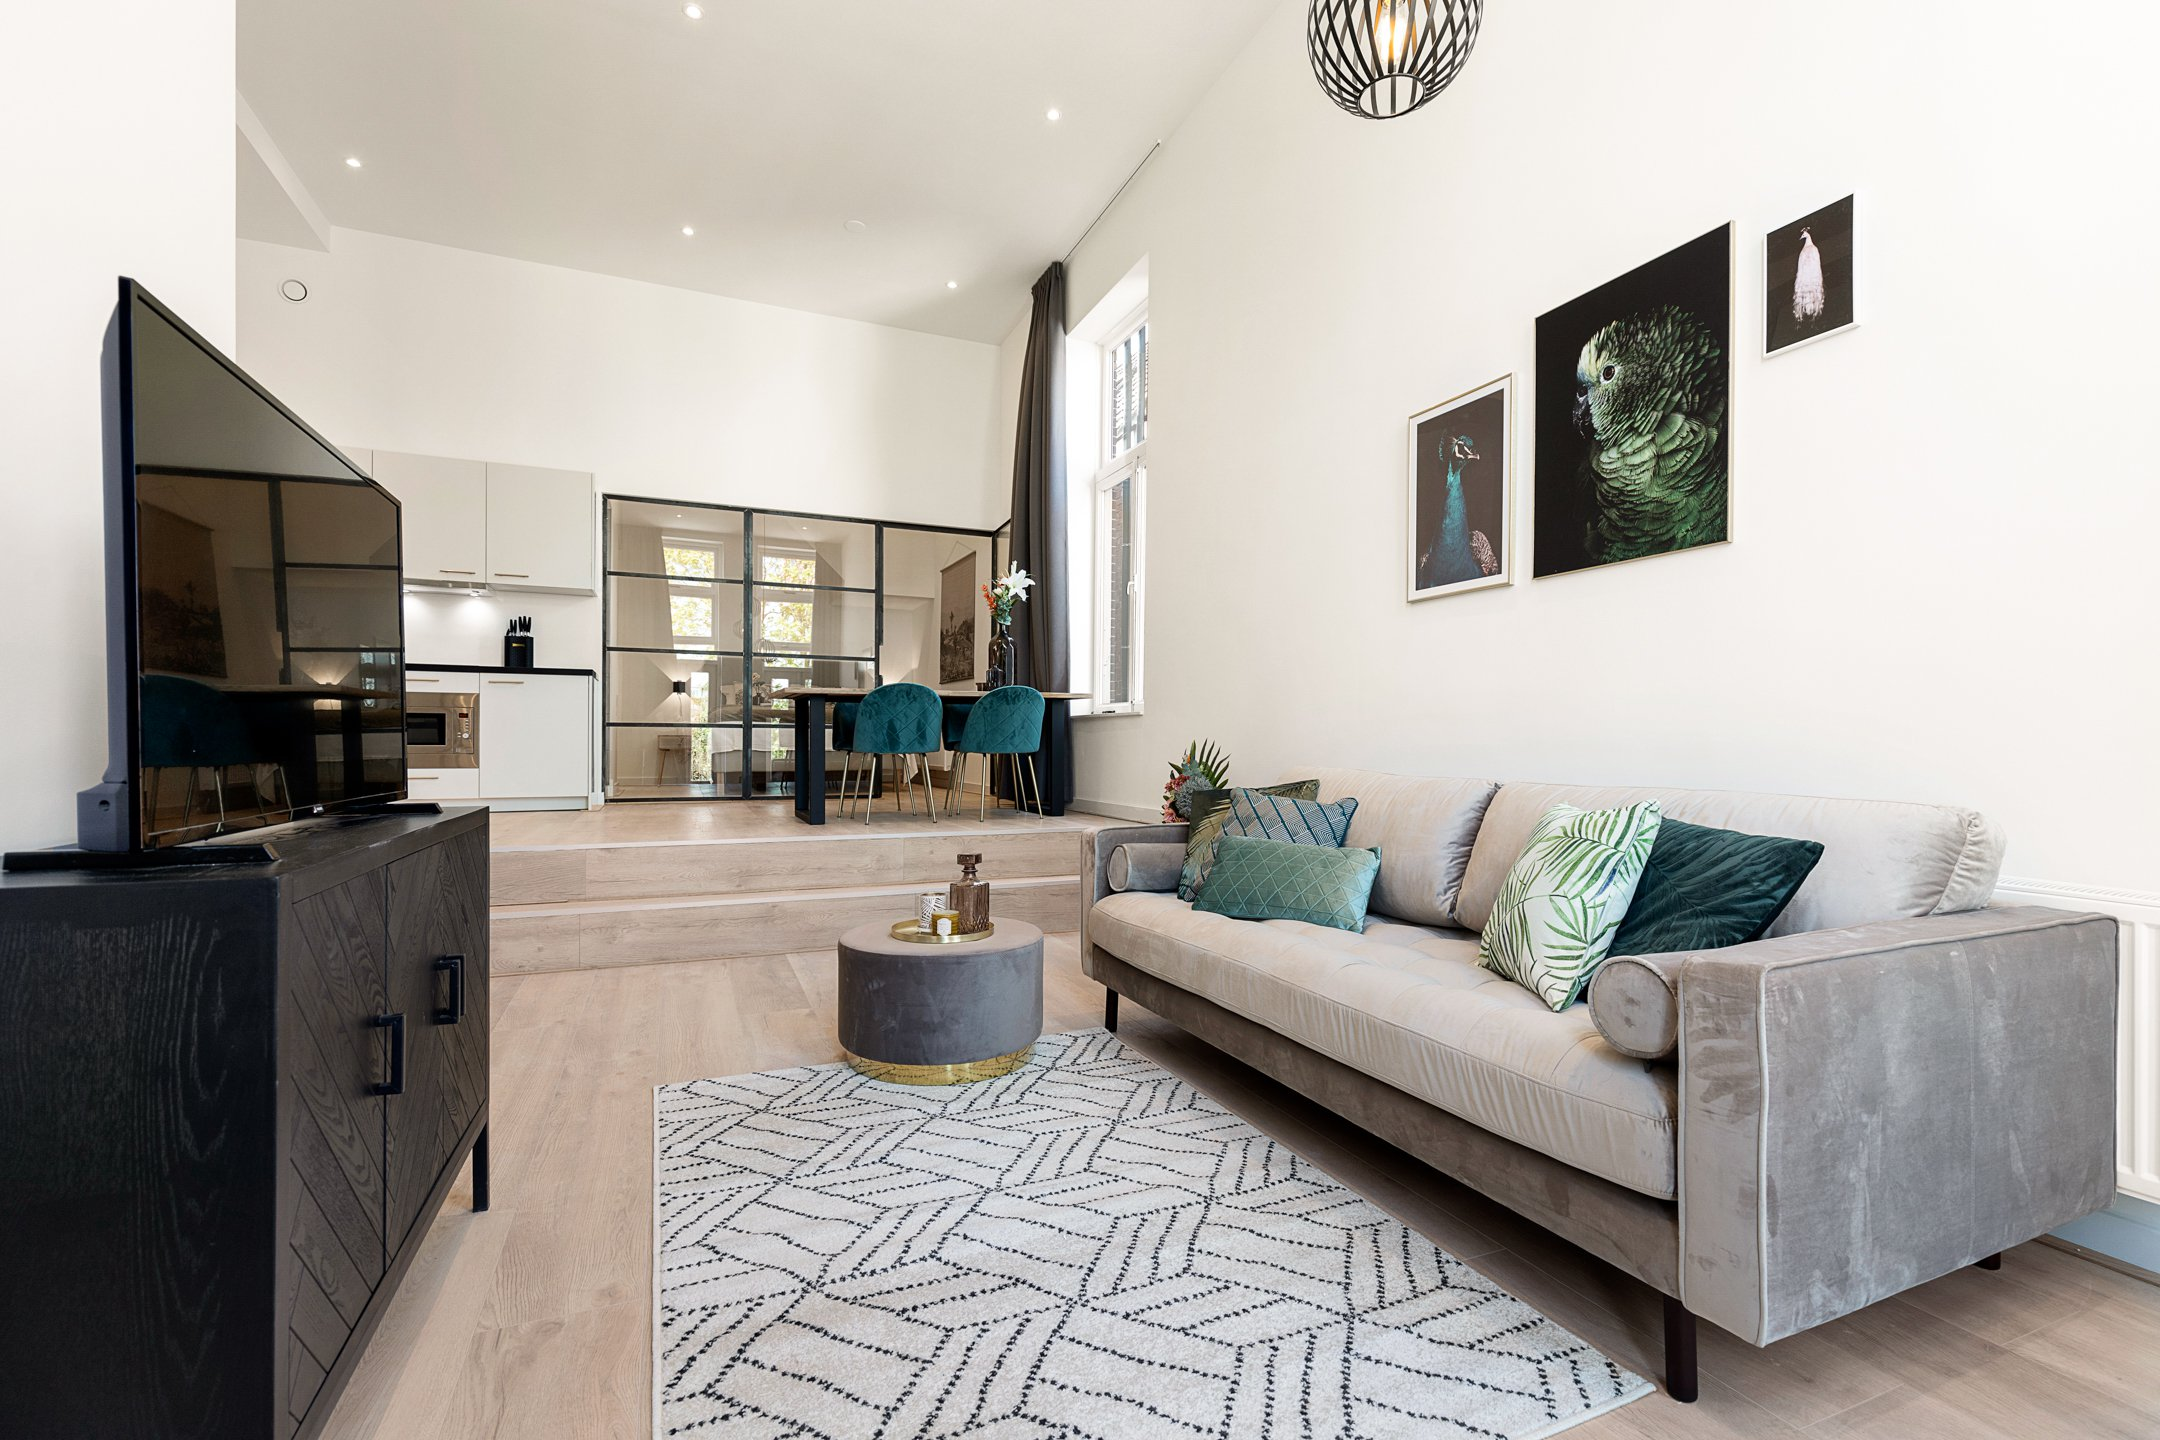 salon-comedor-holanda-kave-interiors